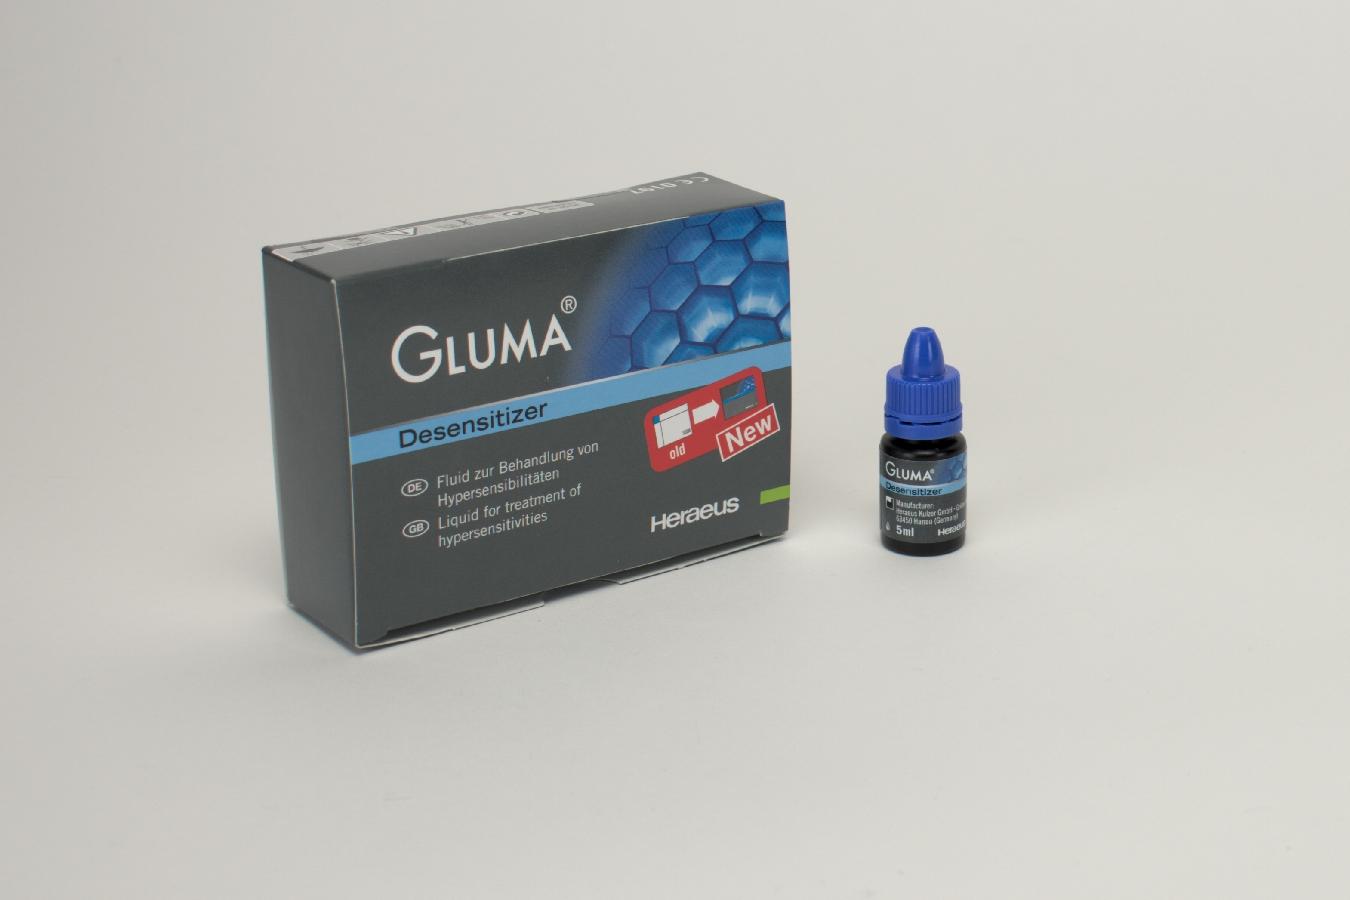 Gluma Desensitizer 5ml Fl